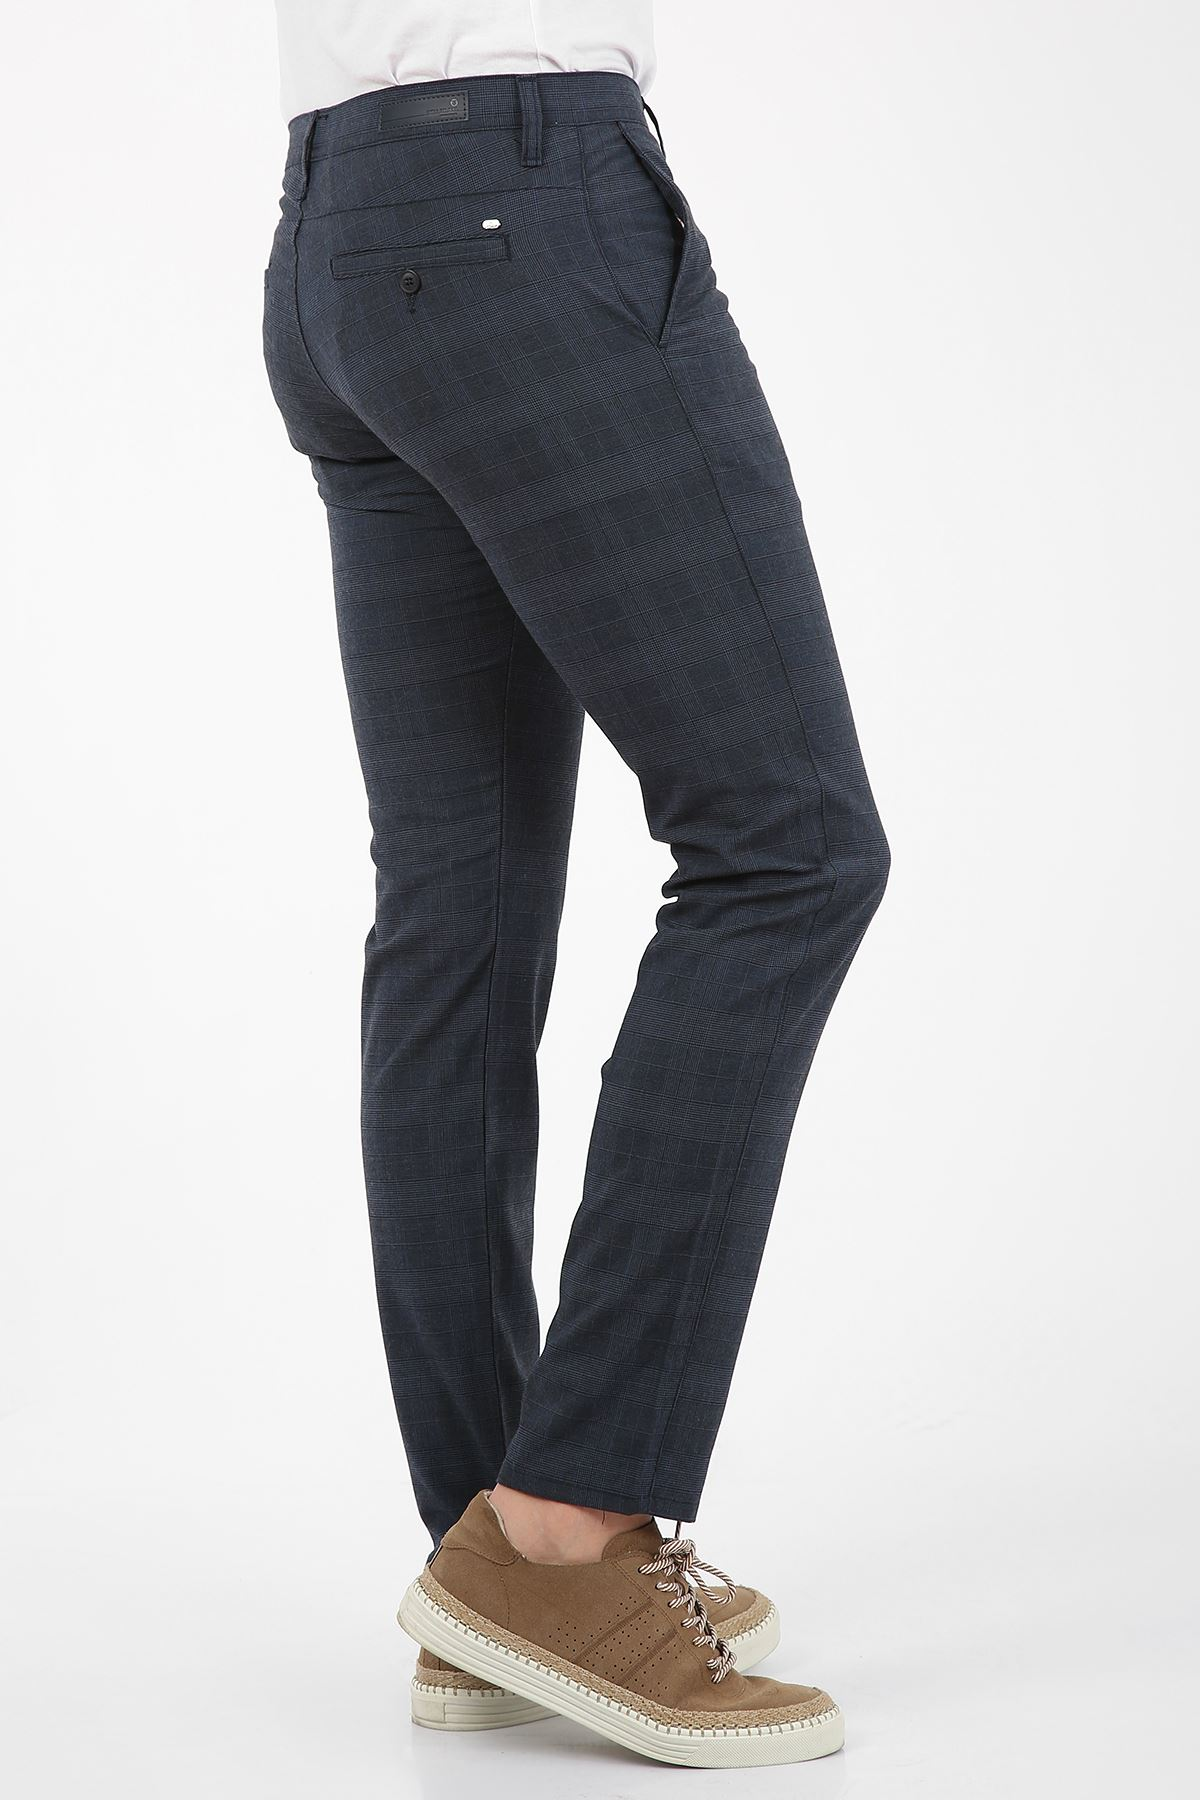 Lacivert Kareli Slim Fit Erkek Chino Pantolon -OLİVER